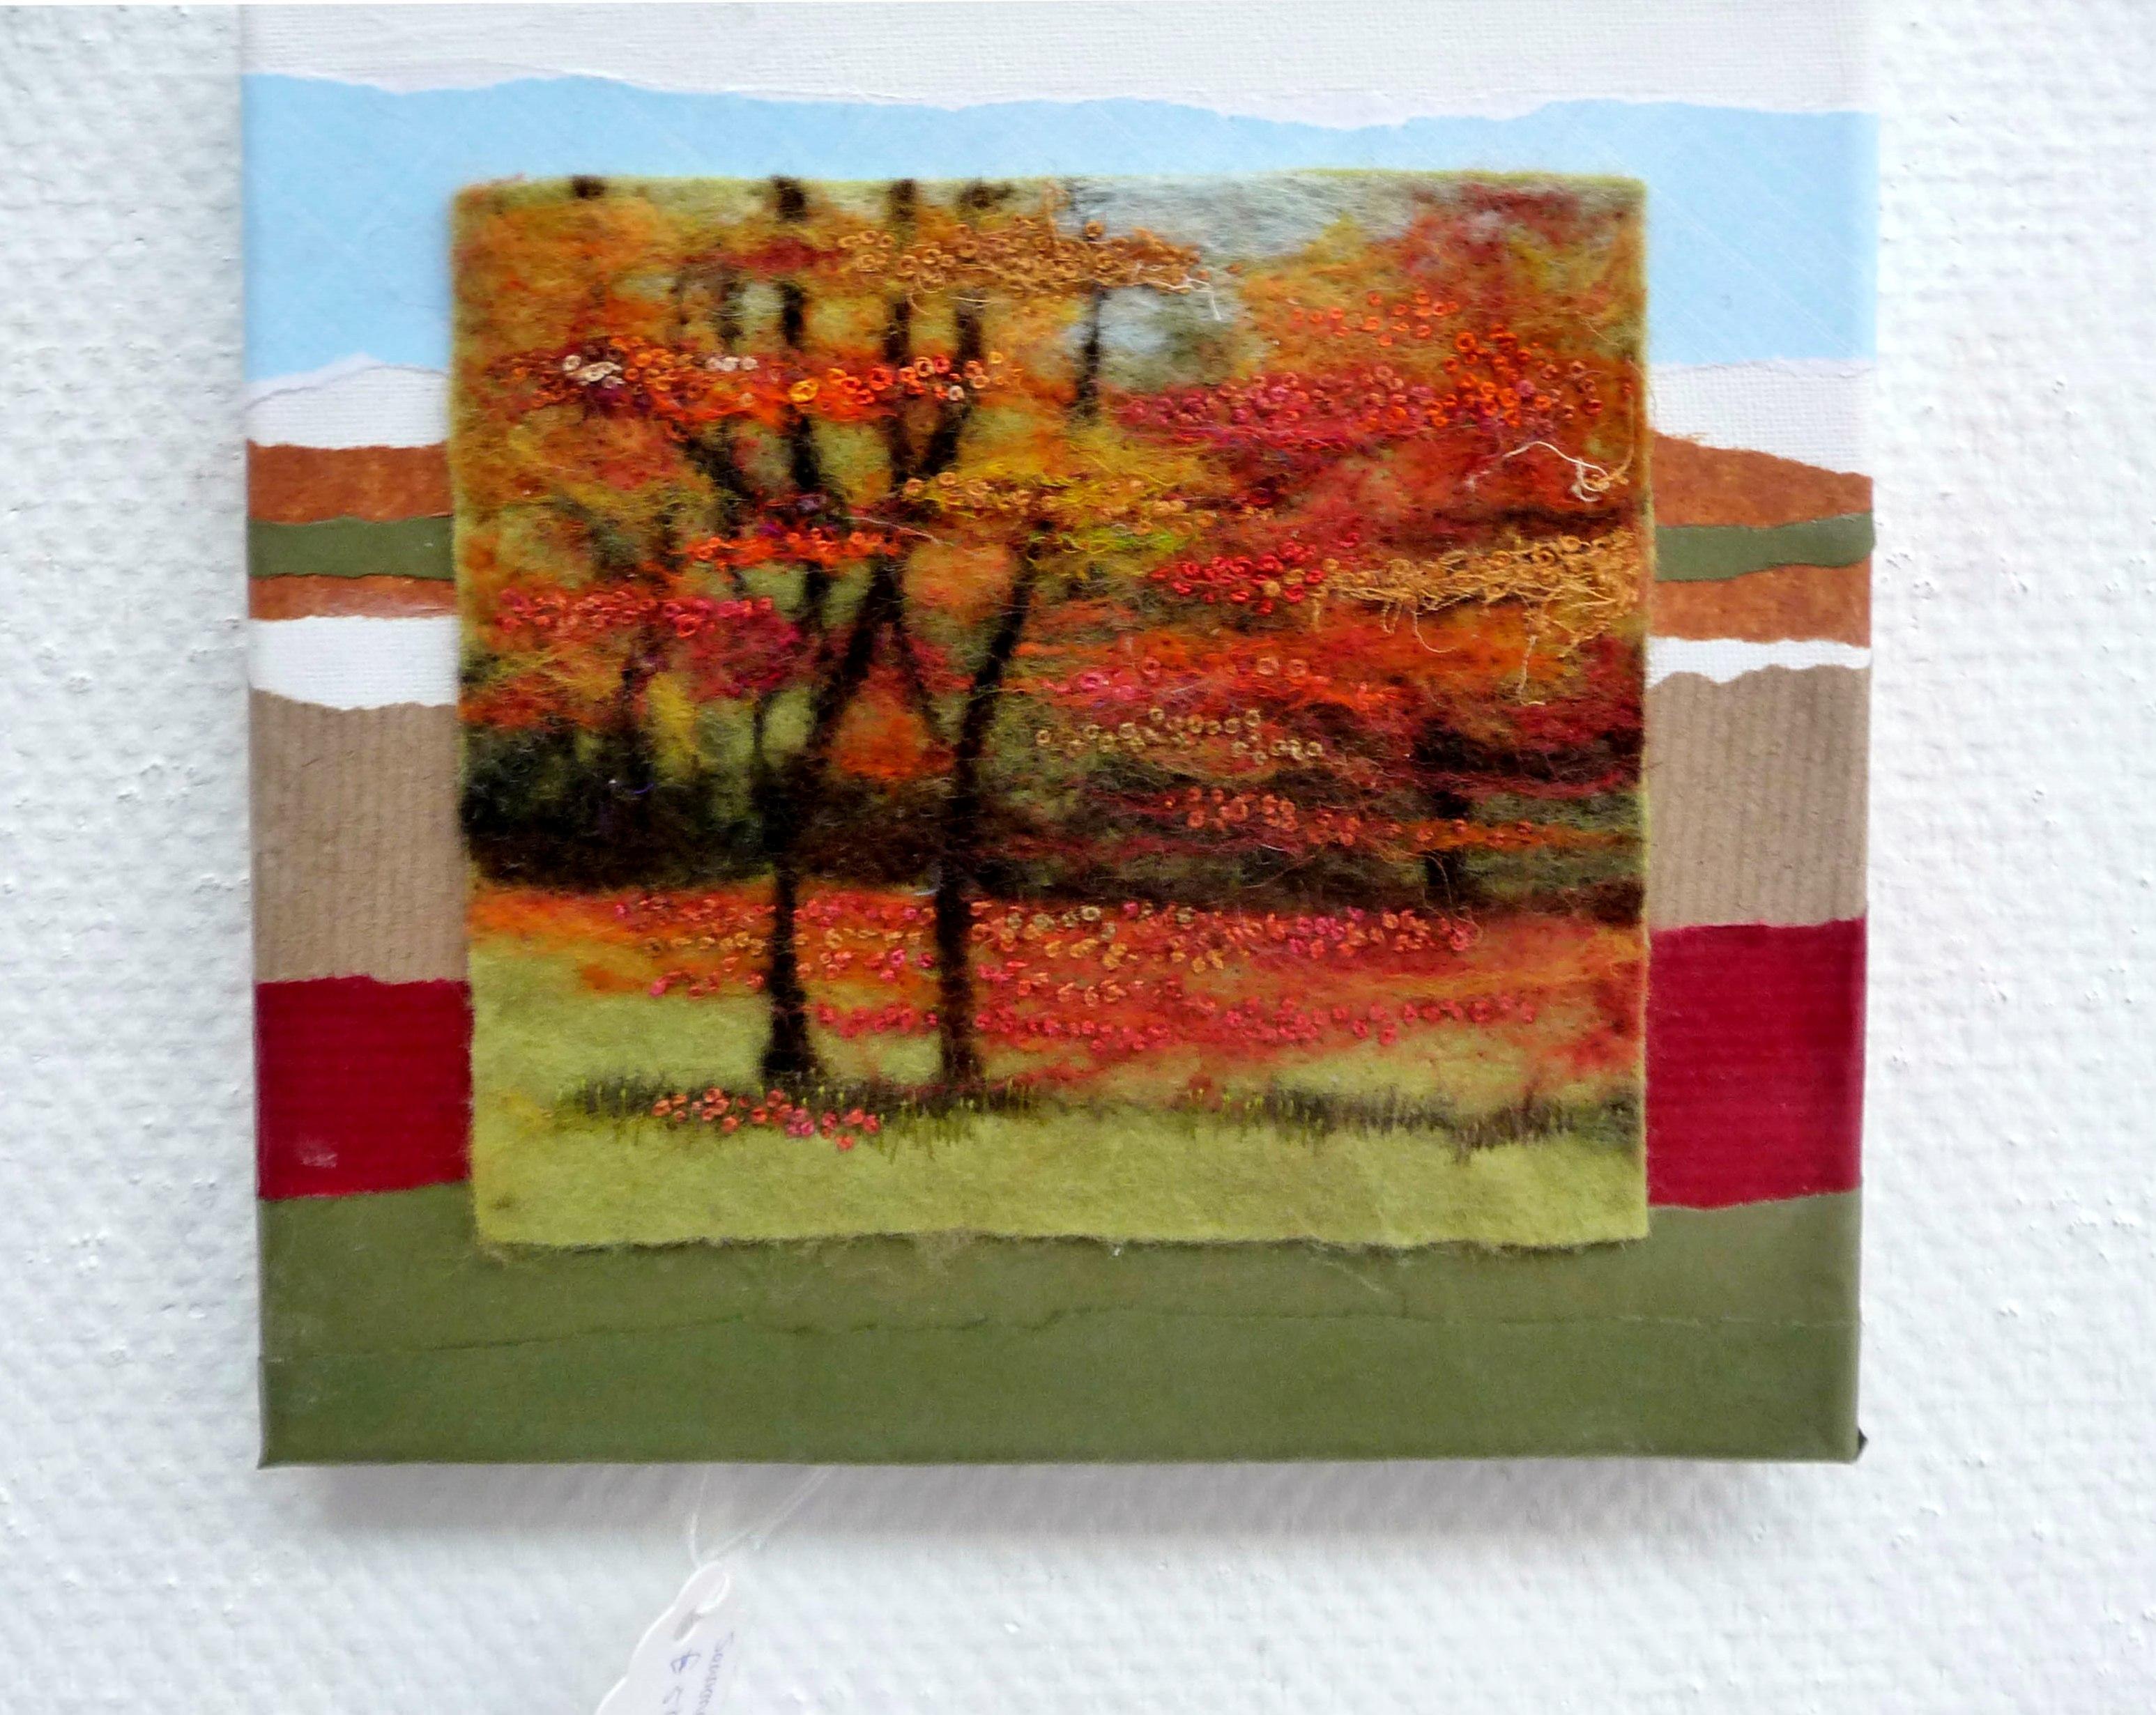 SEASONAL WORK3 by Nicky Robertson, needle-felting & hand stitching on canvas